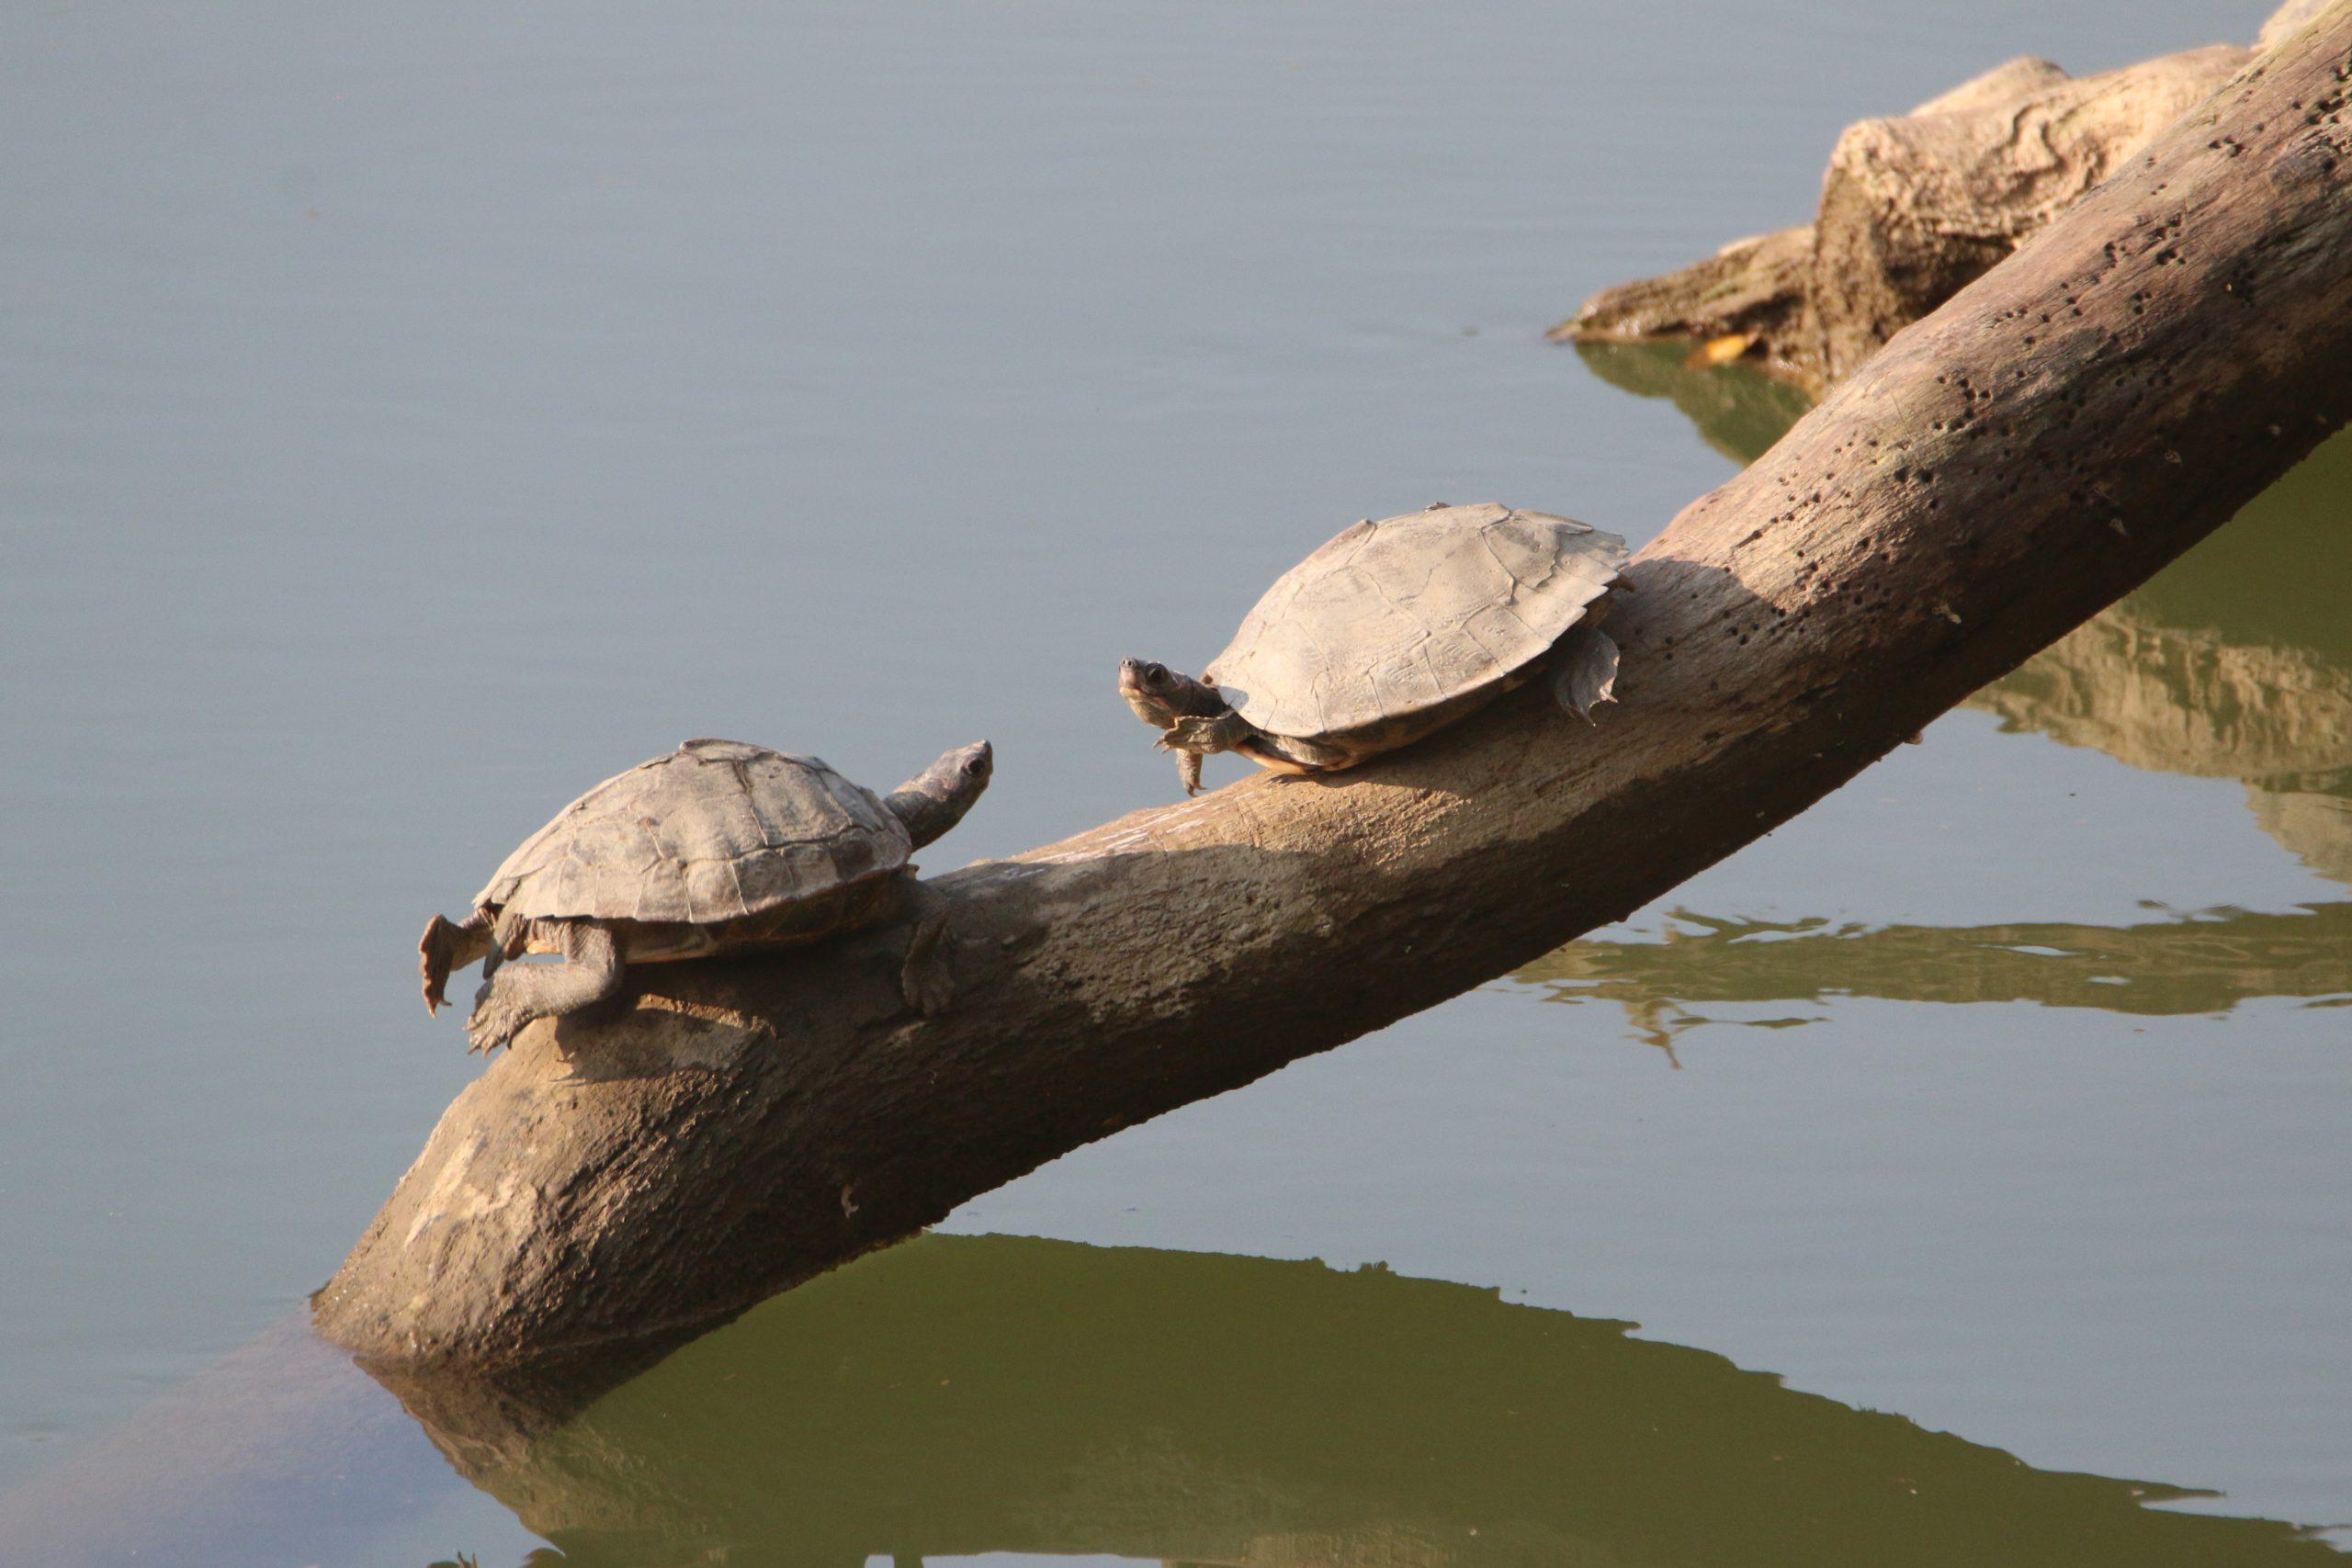 Turtle on wood log near river